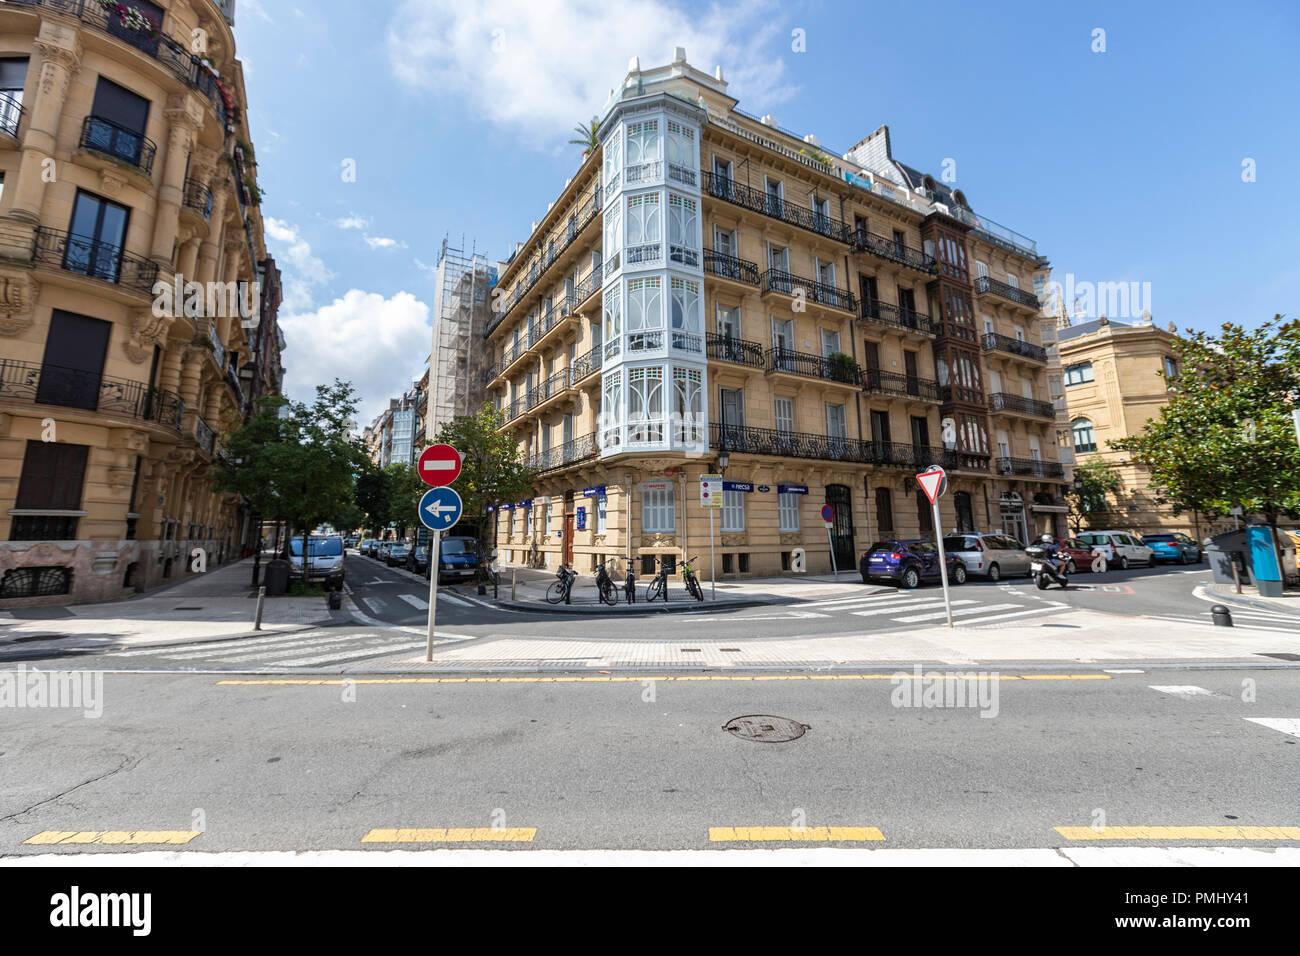 San Sebastian, Donostia, Basque Country, Spain - Stock Image